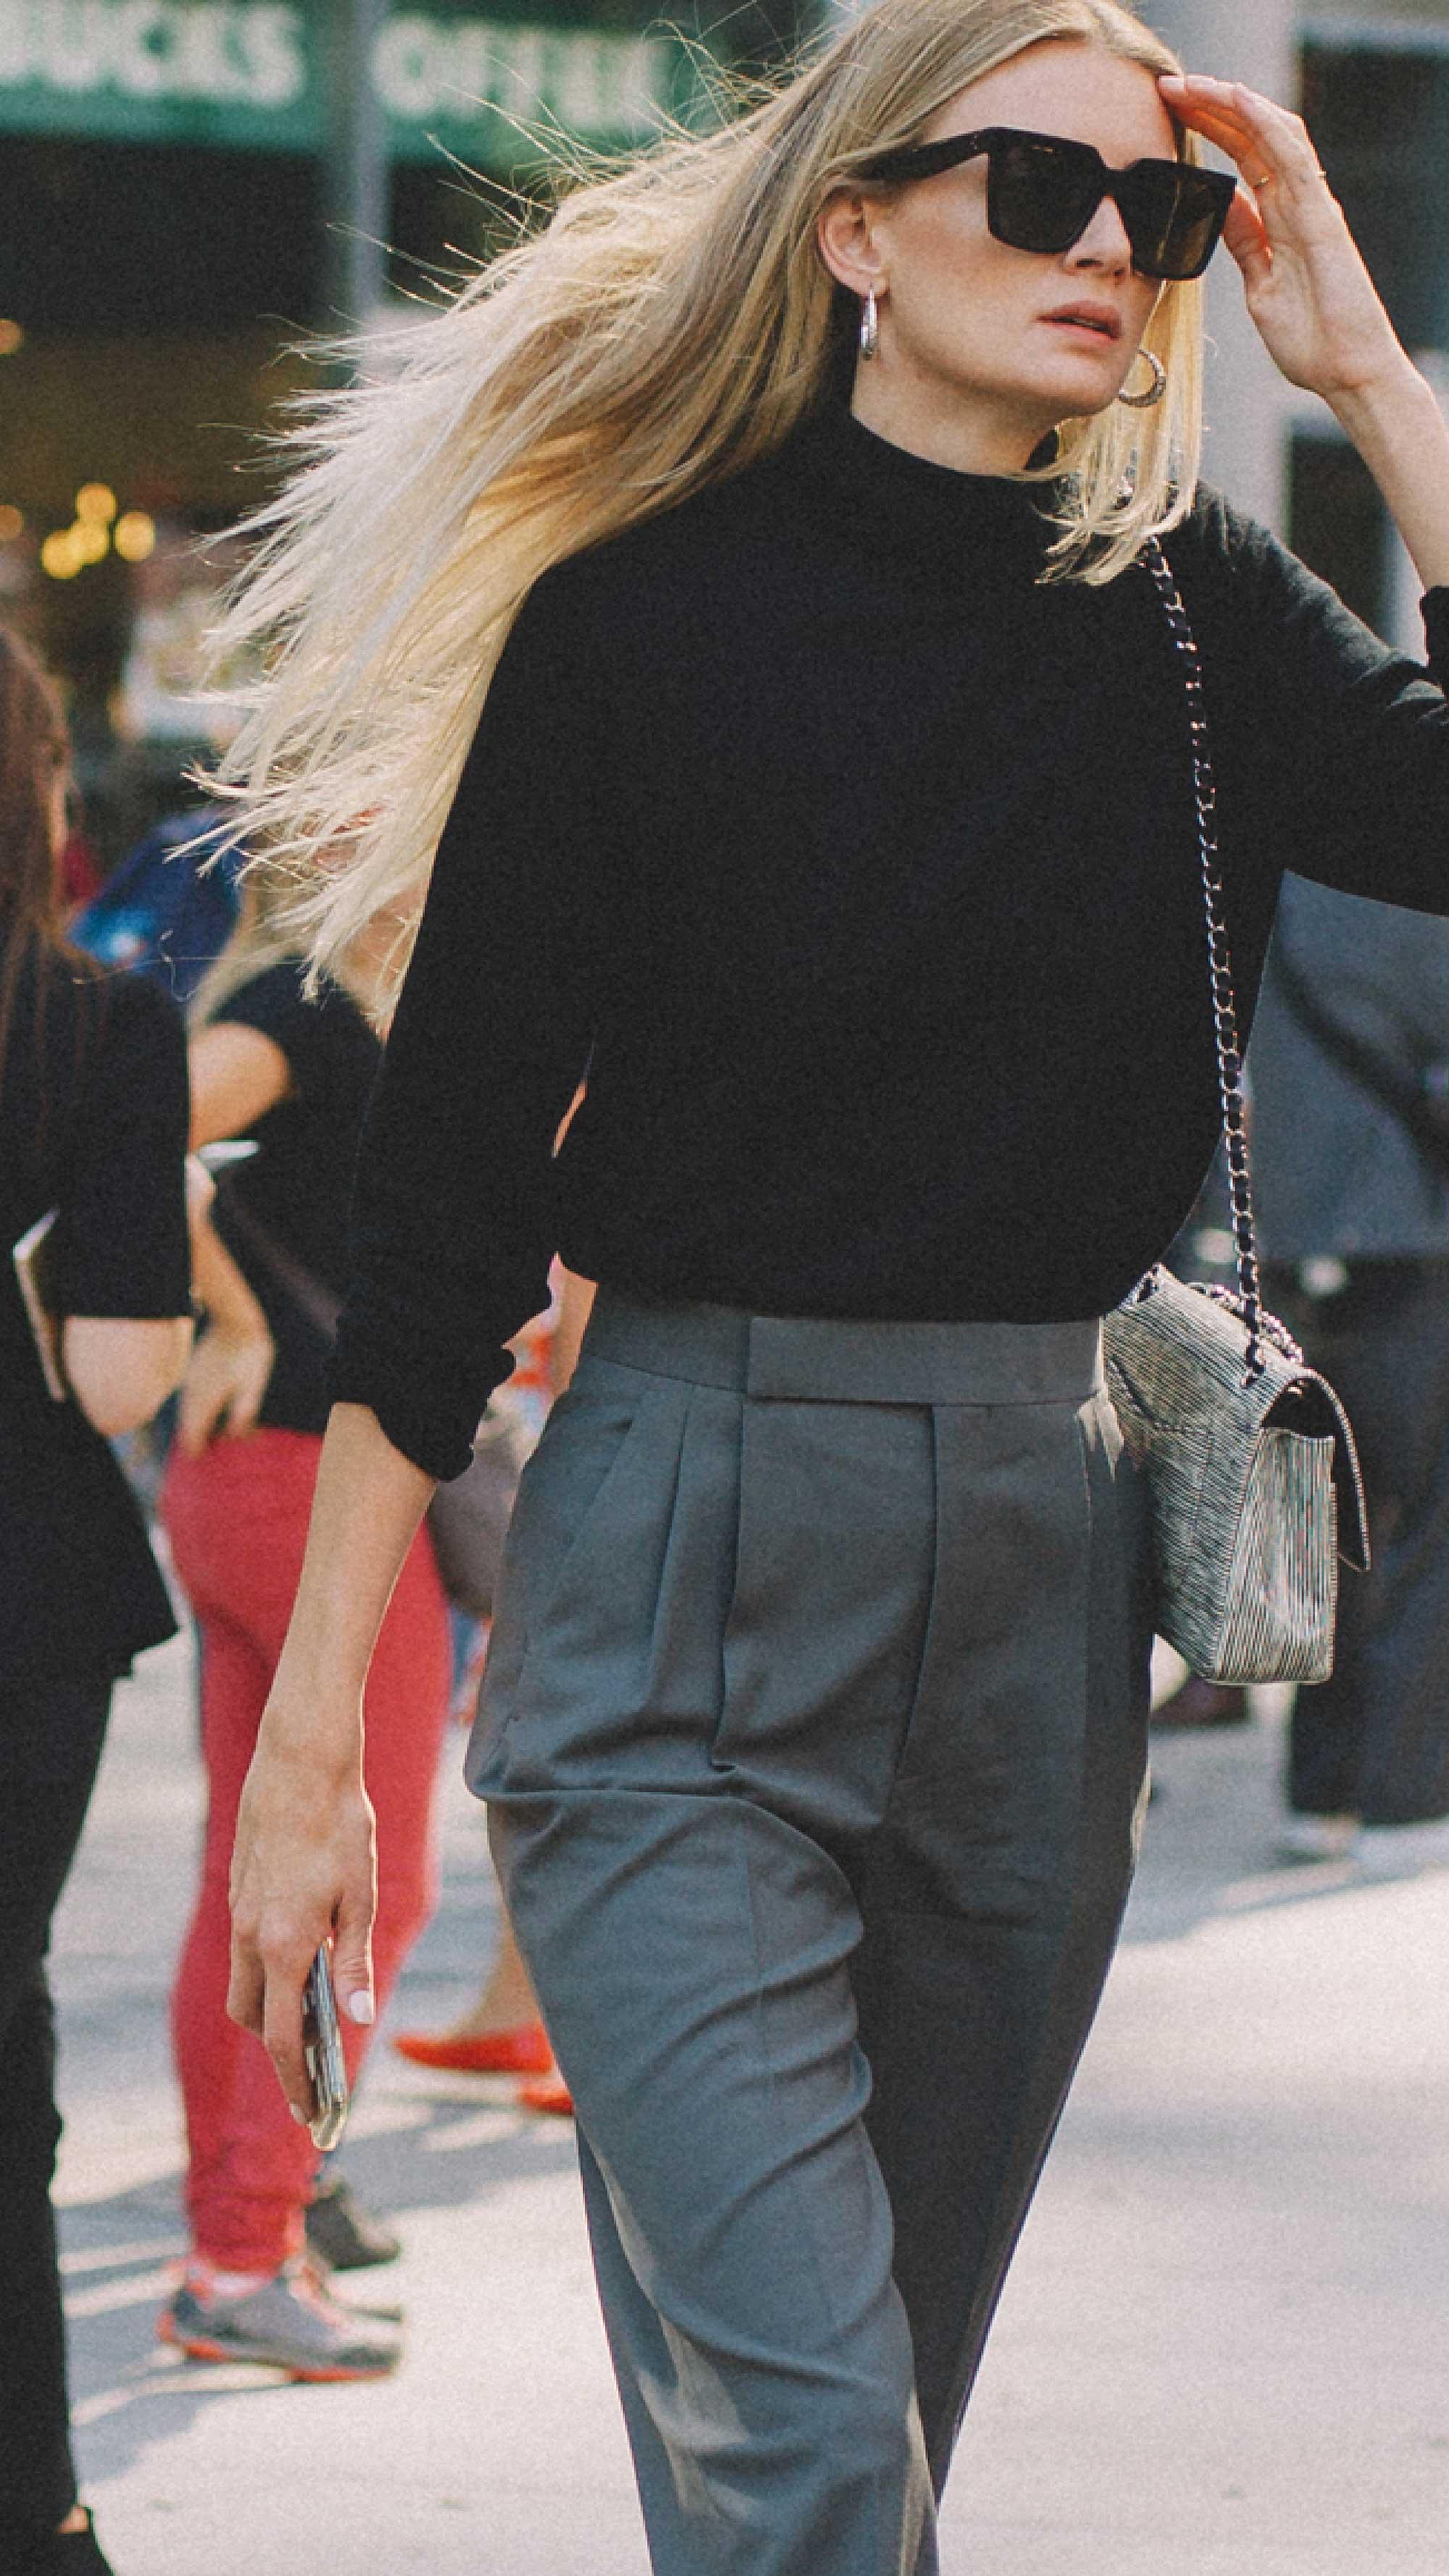 London Fashion Week Street Style Day 3 SS19 -14.jpg